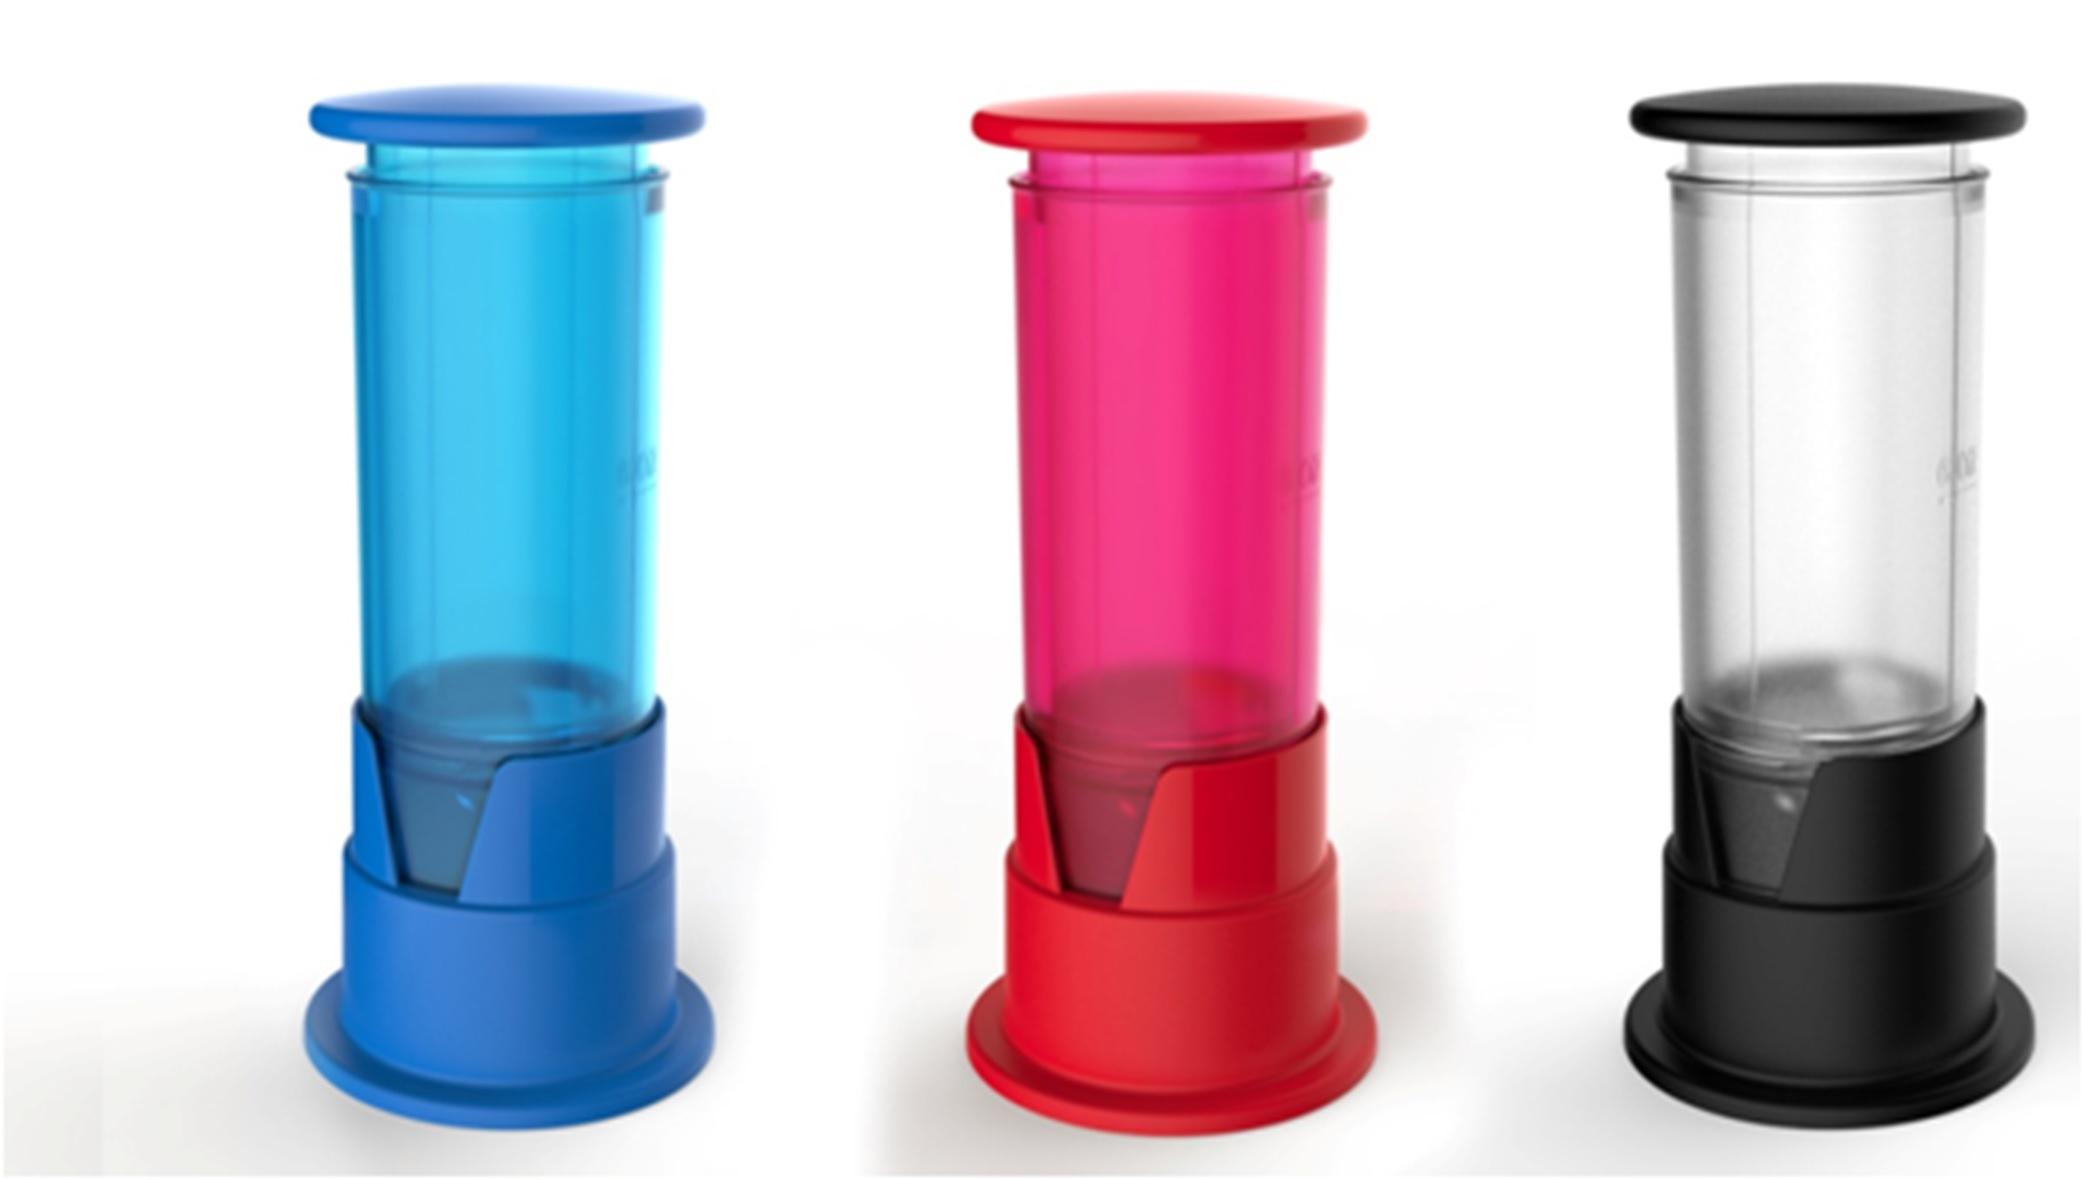 China Hand Press K Cup Coffee Maker Bpa Free China En Plastique